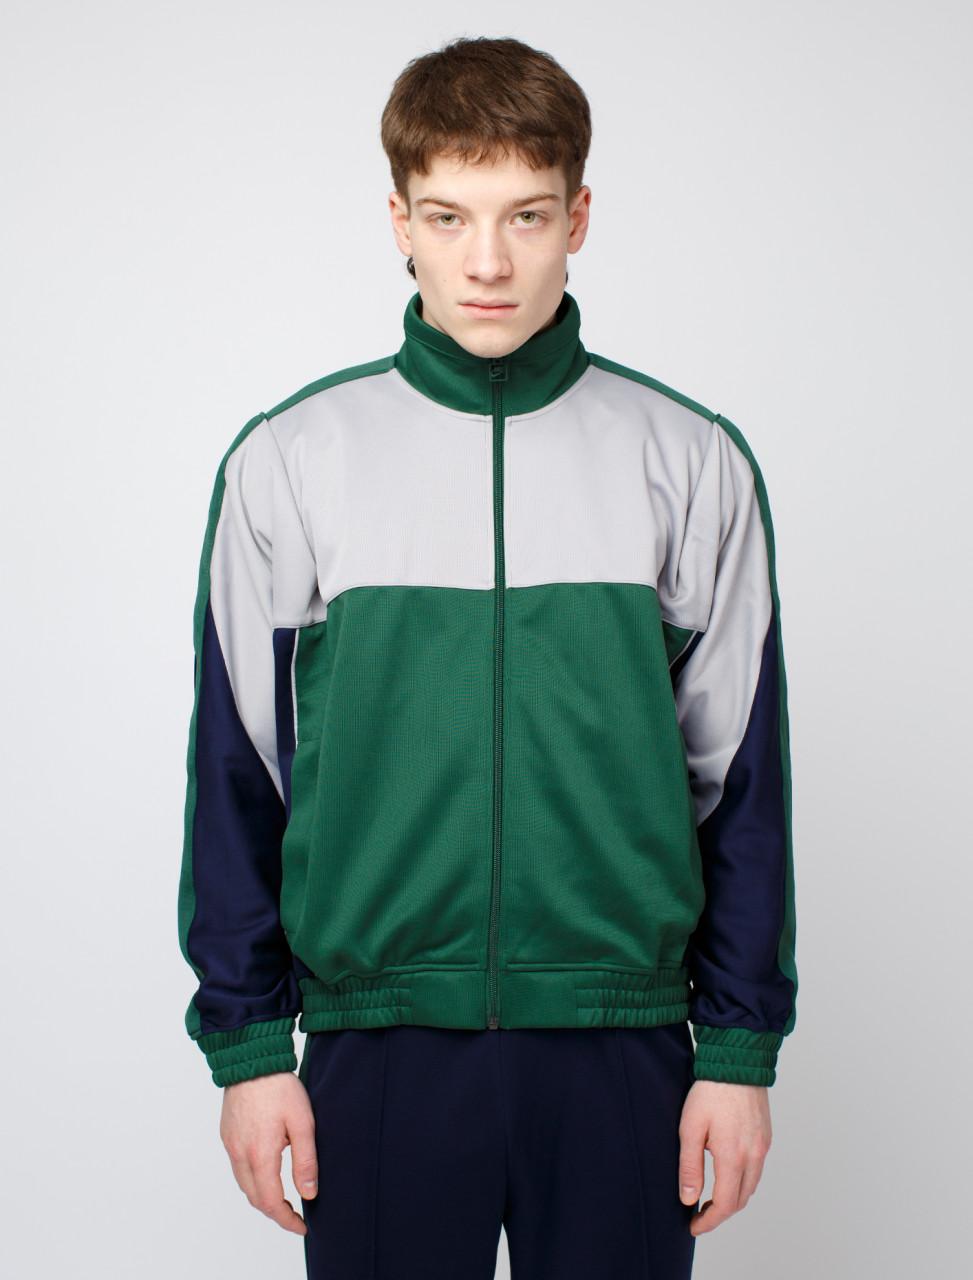 bfca2c1e2807 Nike x Martine Rose K Track Jacket